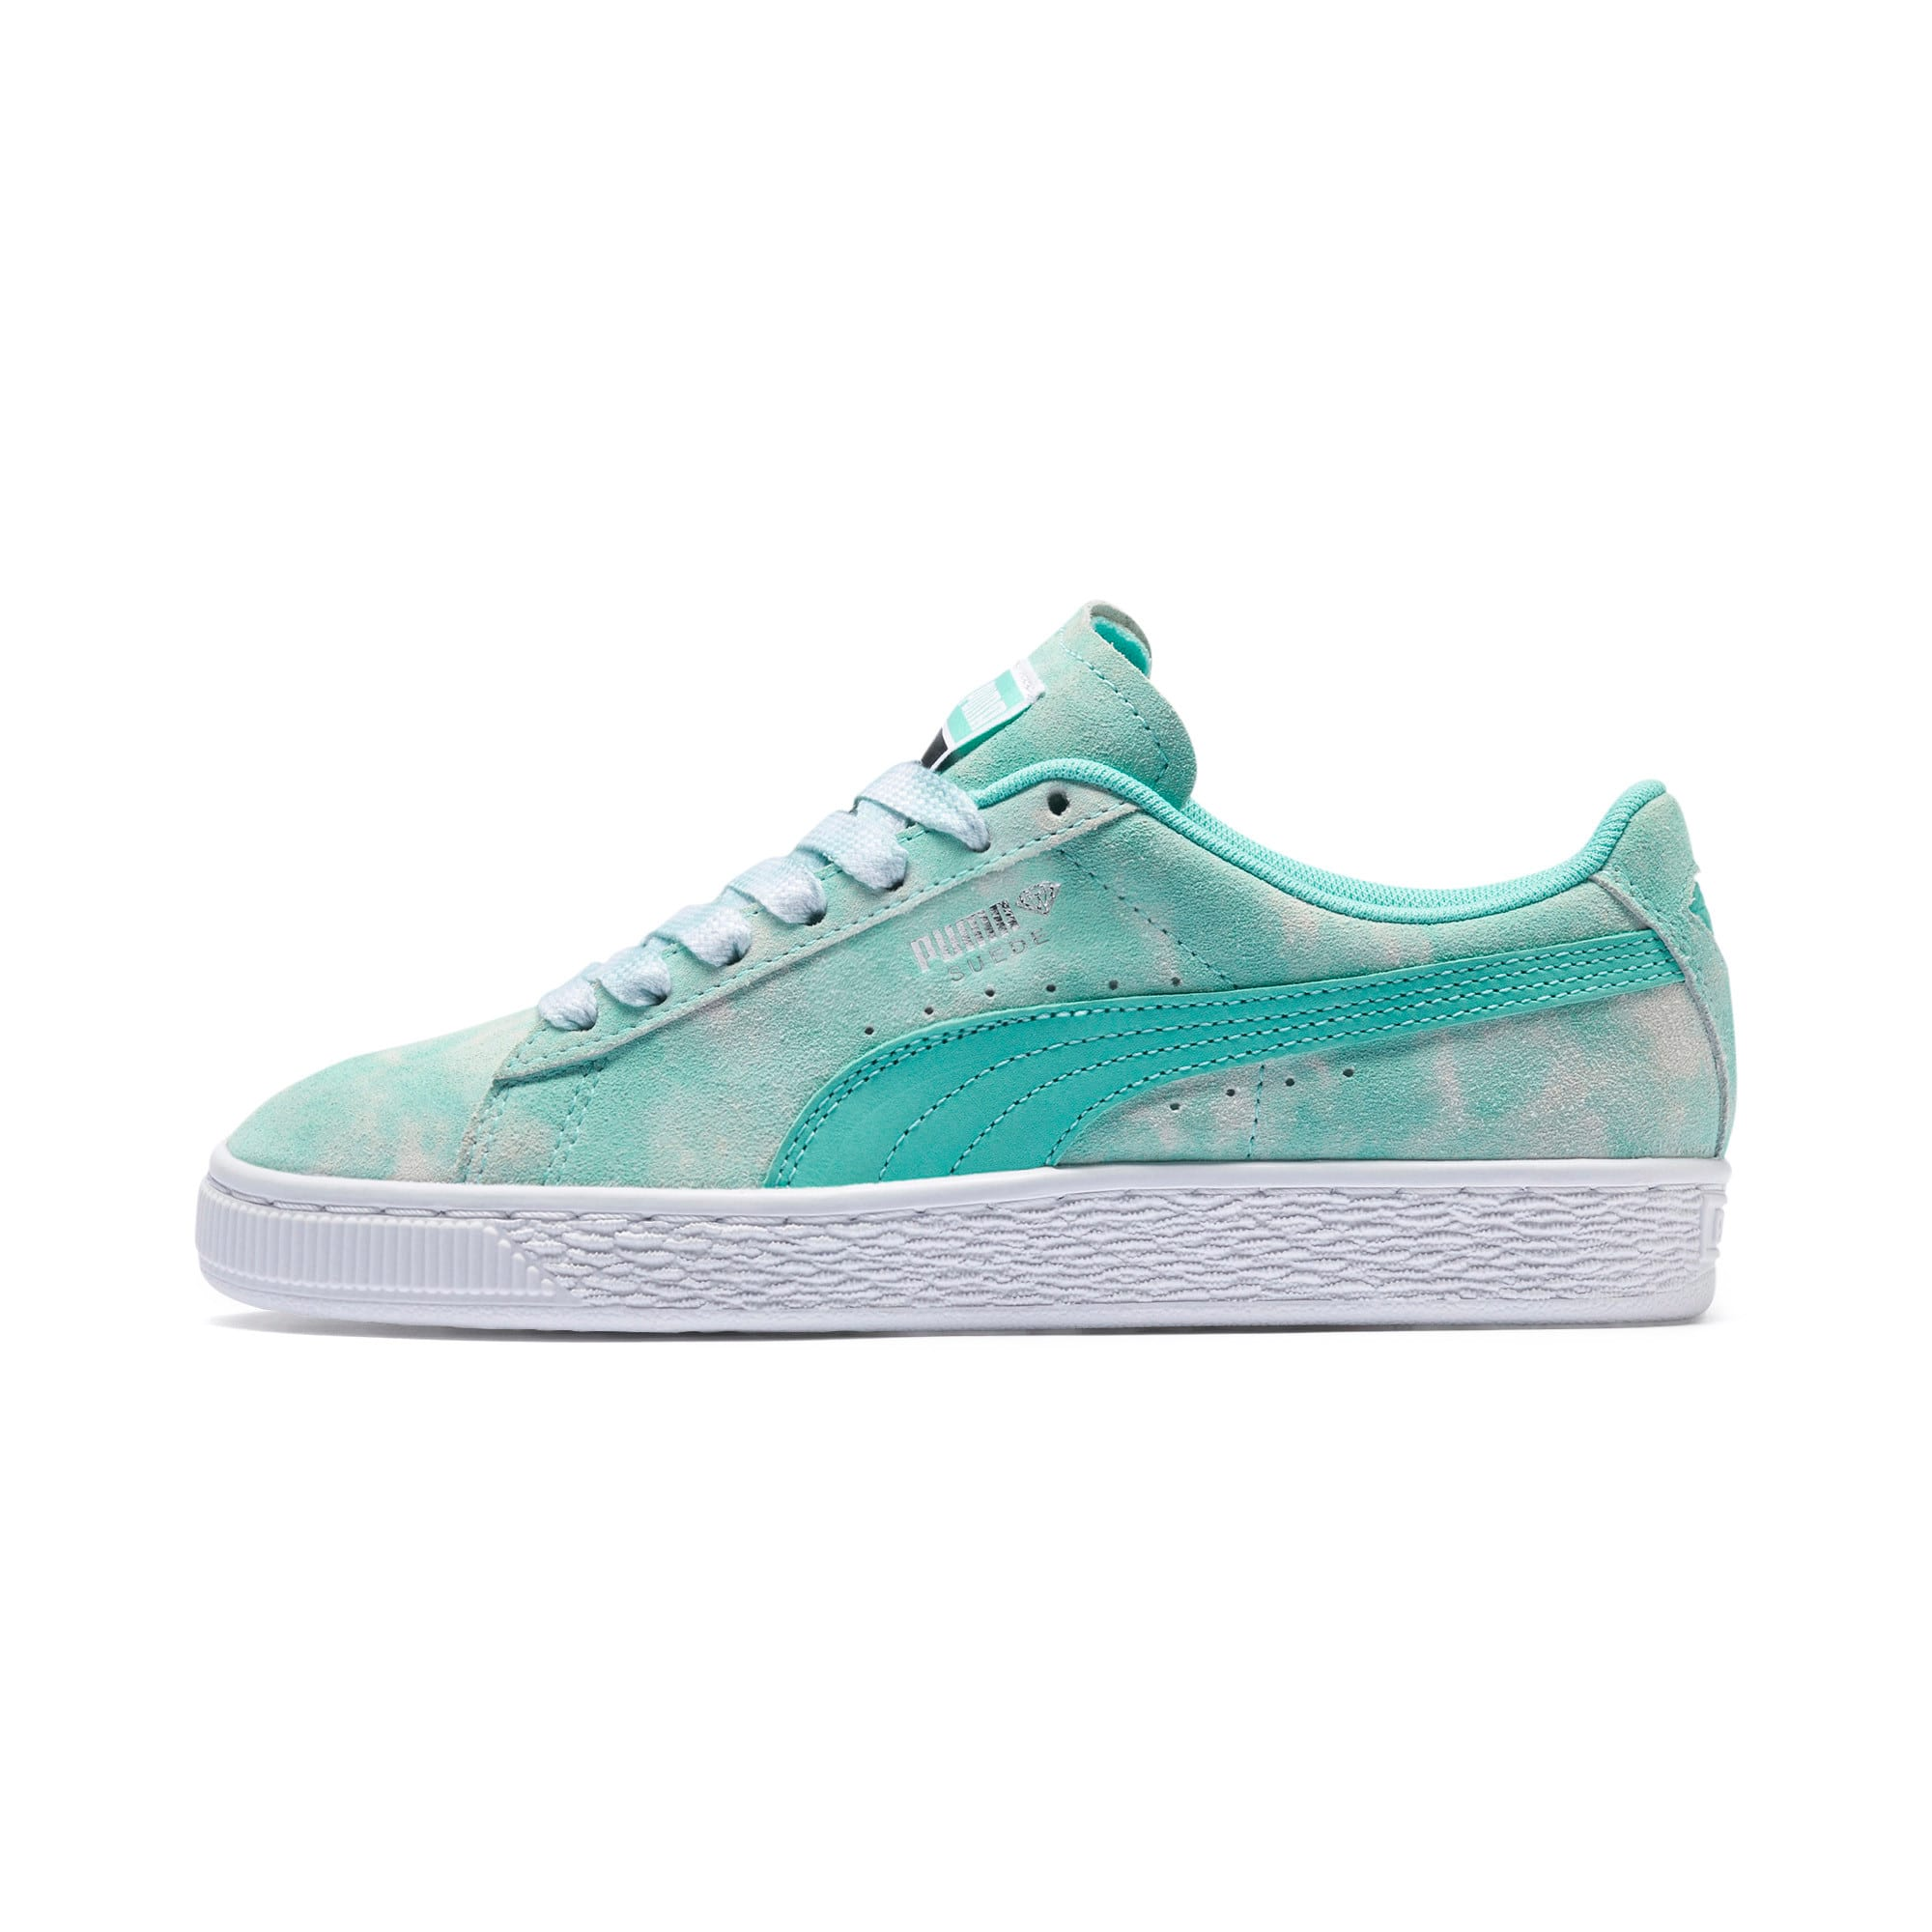 Miniatura 1 de Zapatos deportivosPUMA x DIAMOND SUPPLY CO. Suede JR, Diamond Blue-Diamond Blue, mediano